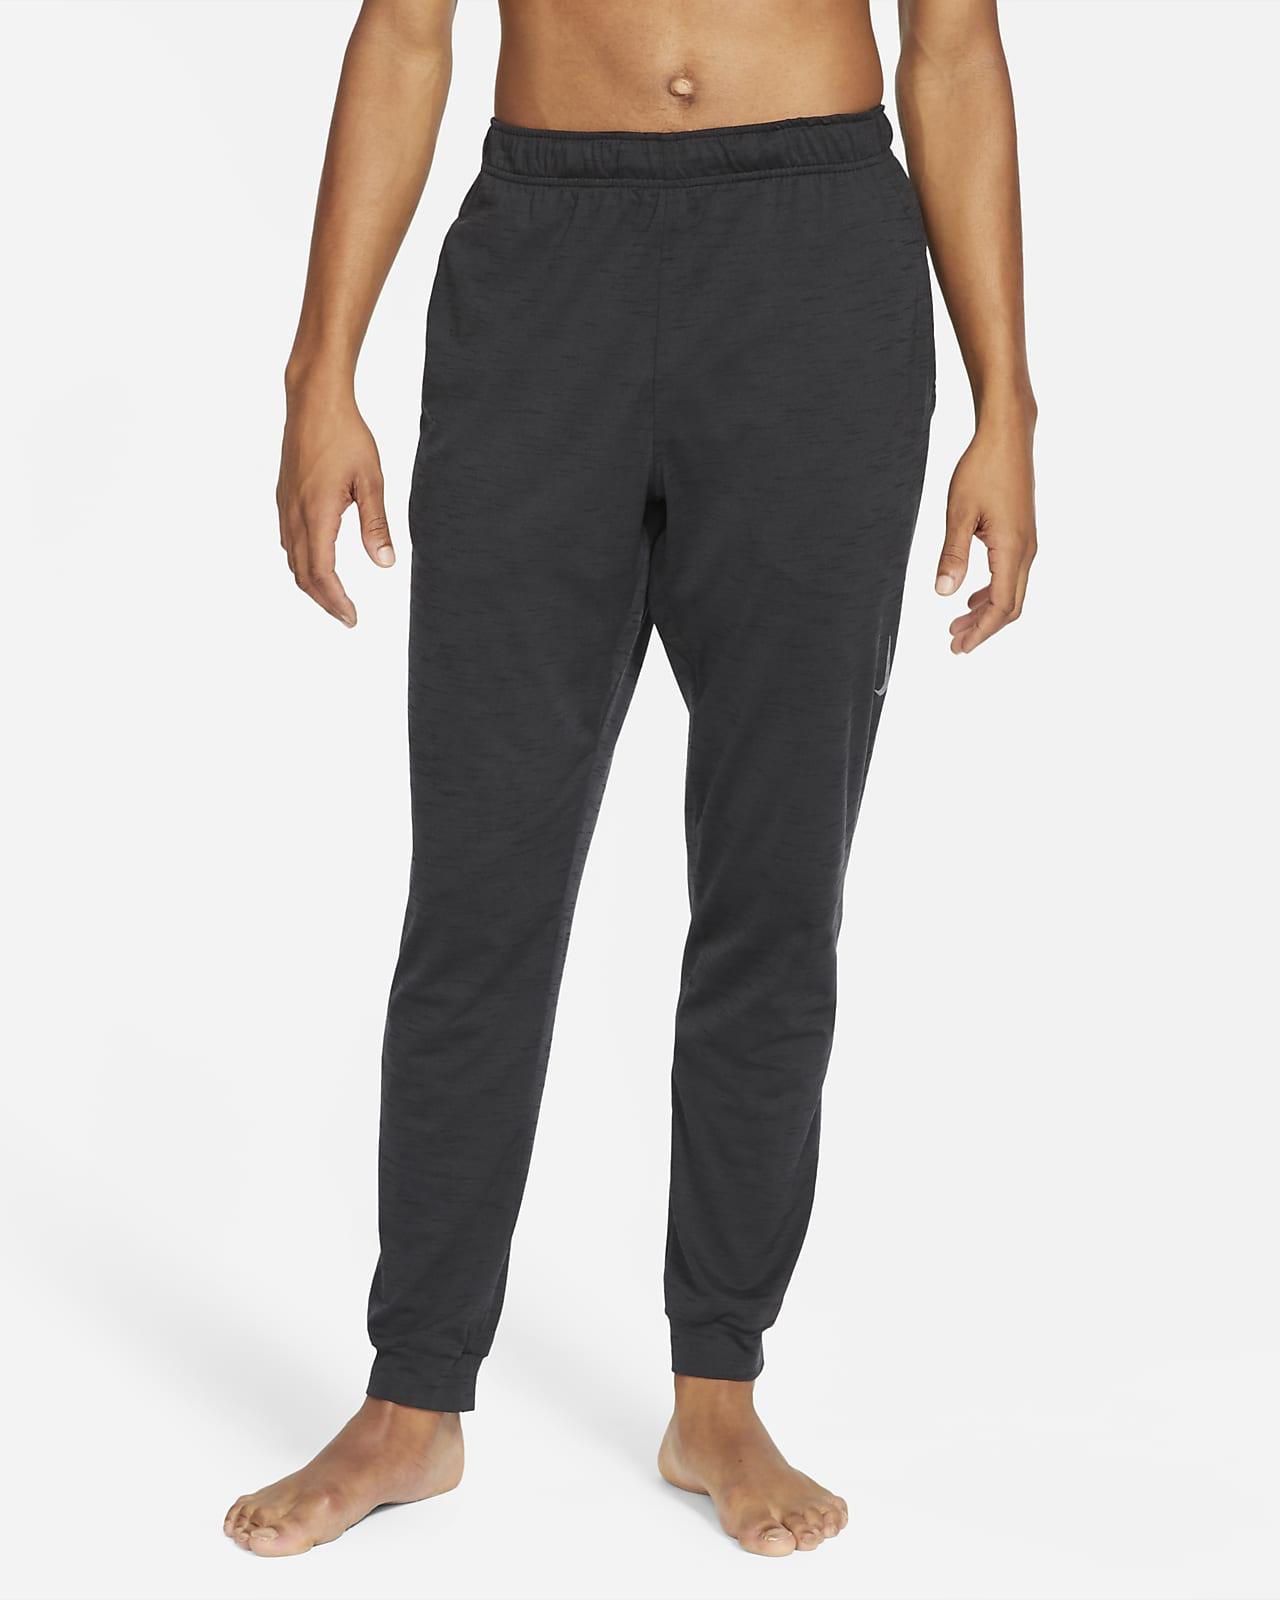 Pantalon Nike Yoga Dri-FIT pour Homme